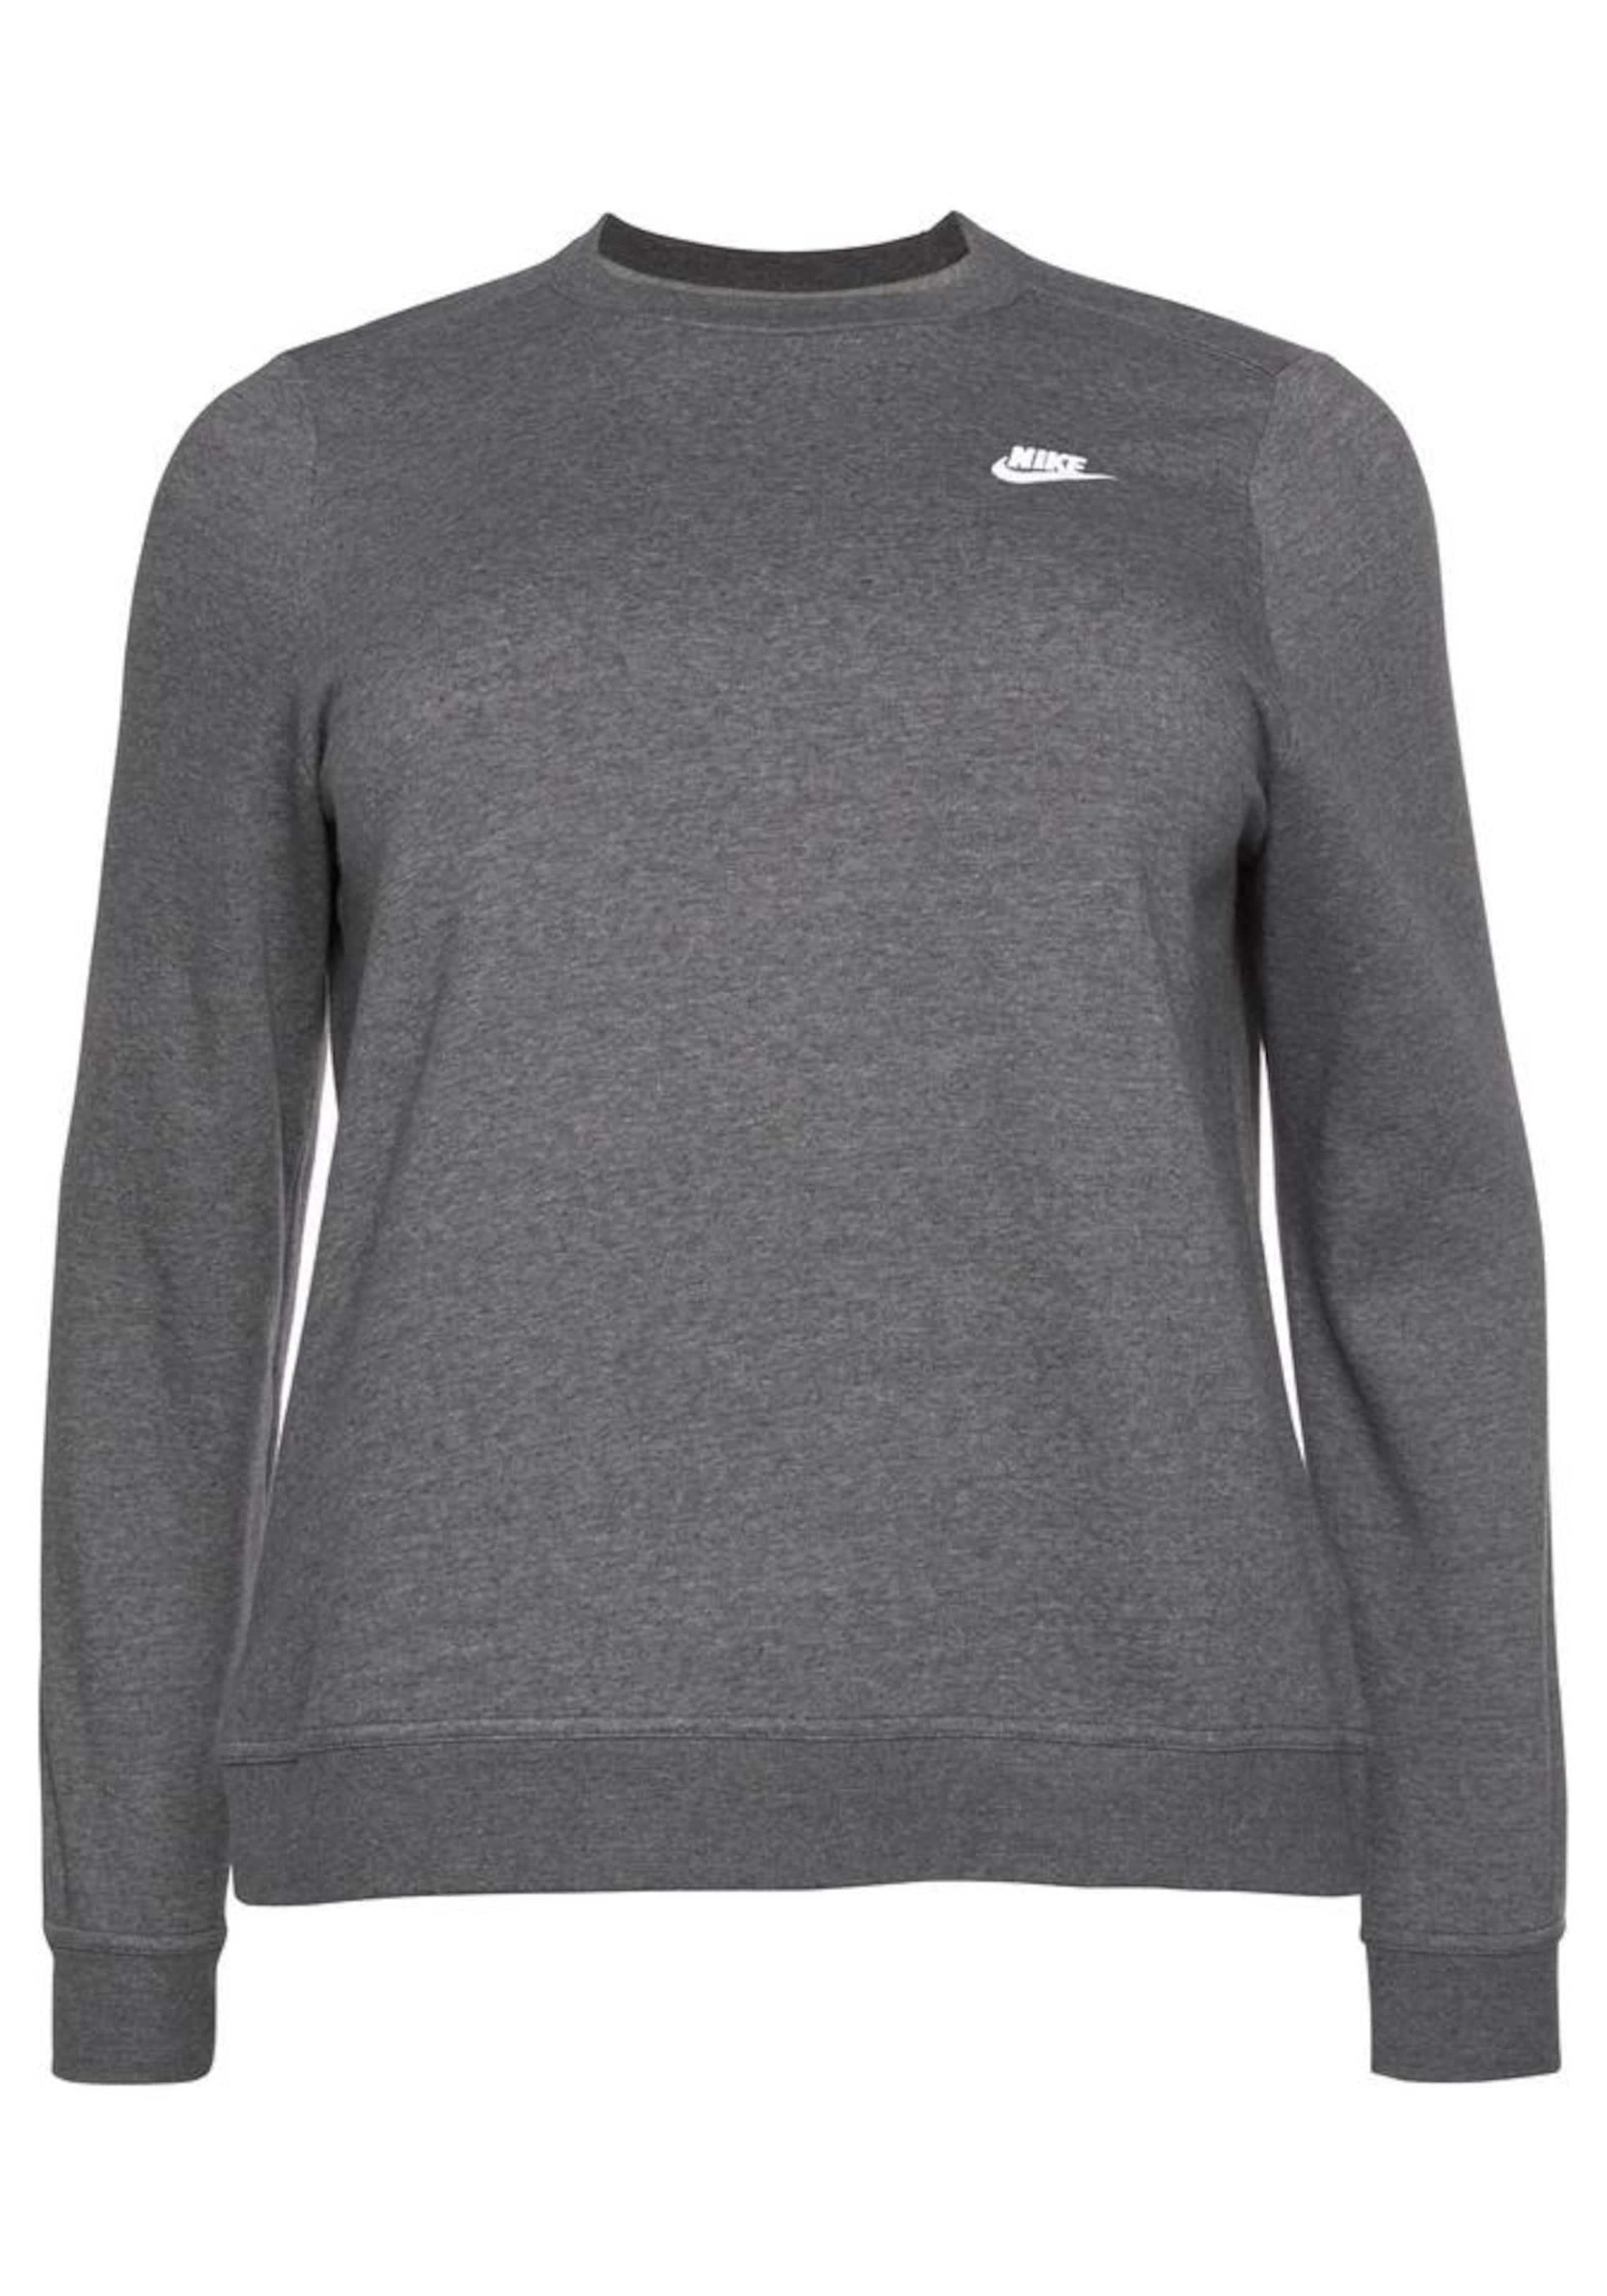 Sportswear In Nike GraumeliertWeiß Sweatshirt Nike drCxhtsQ